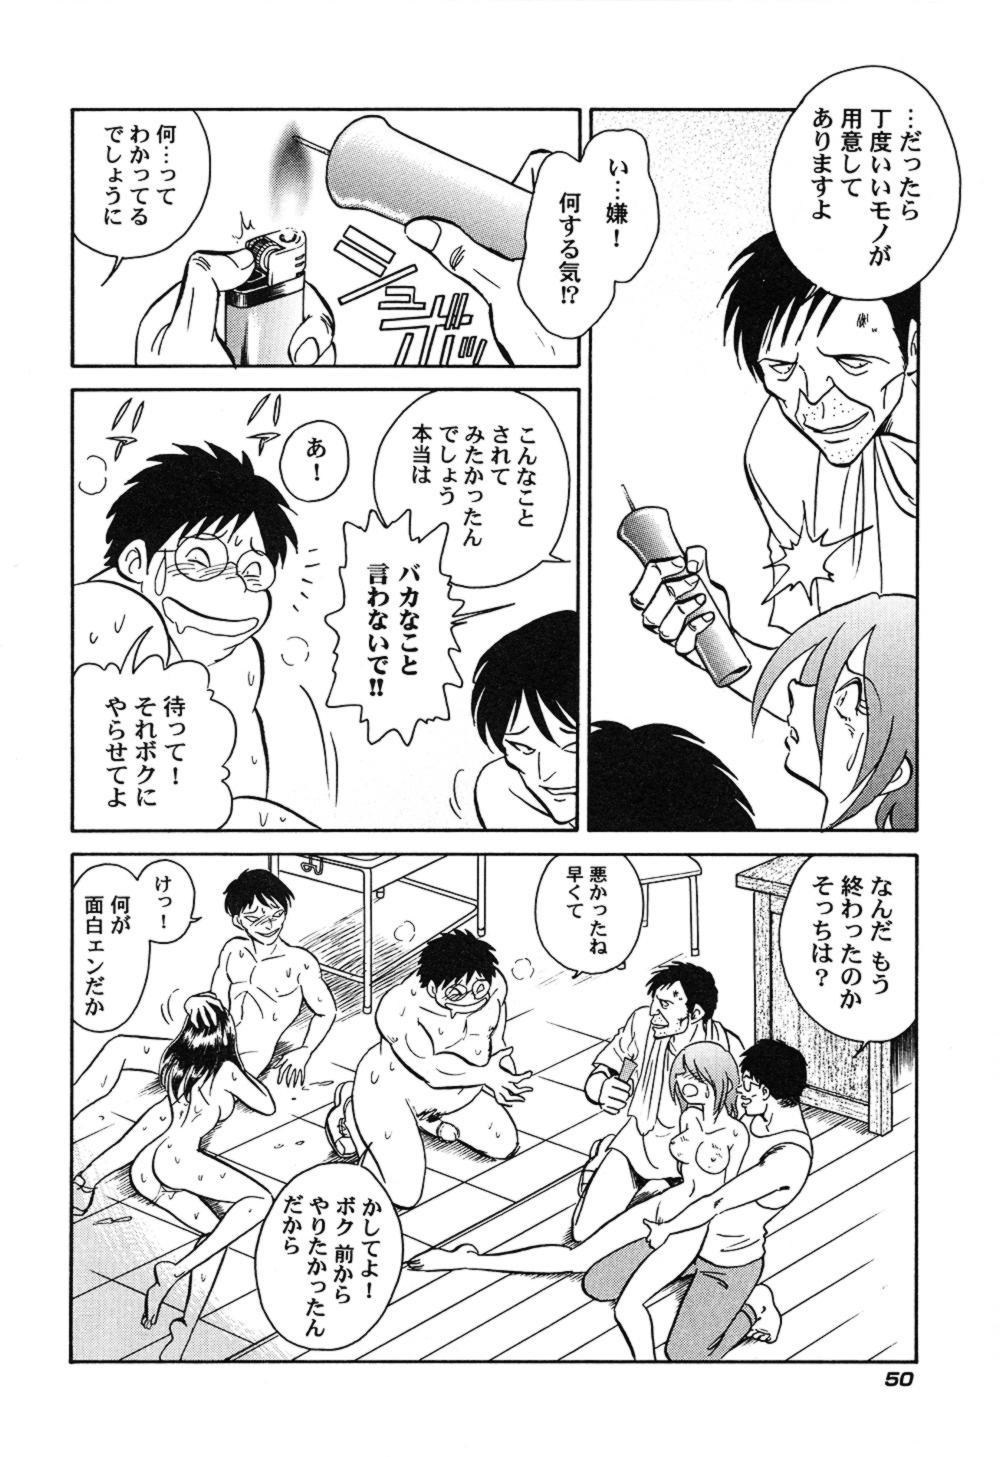 Hageshii Kagai Jugyou 52